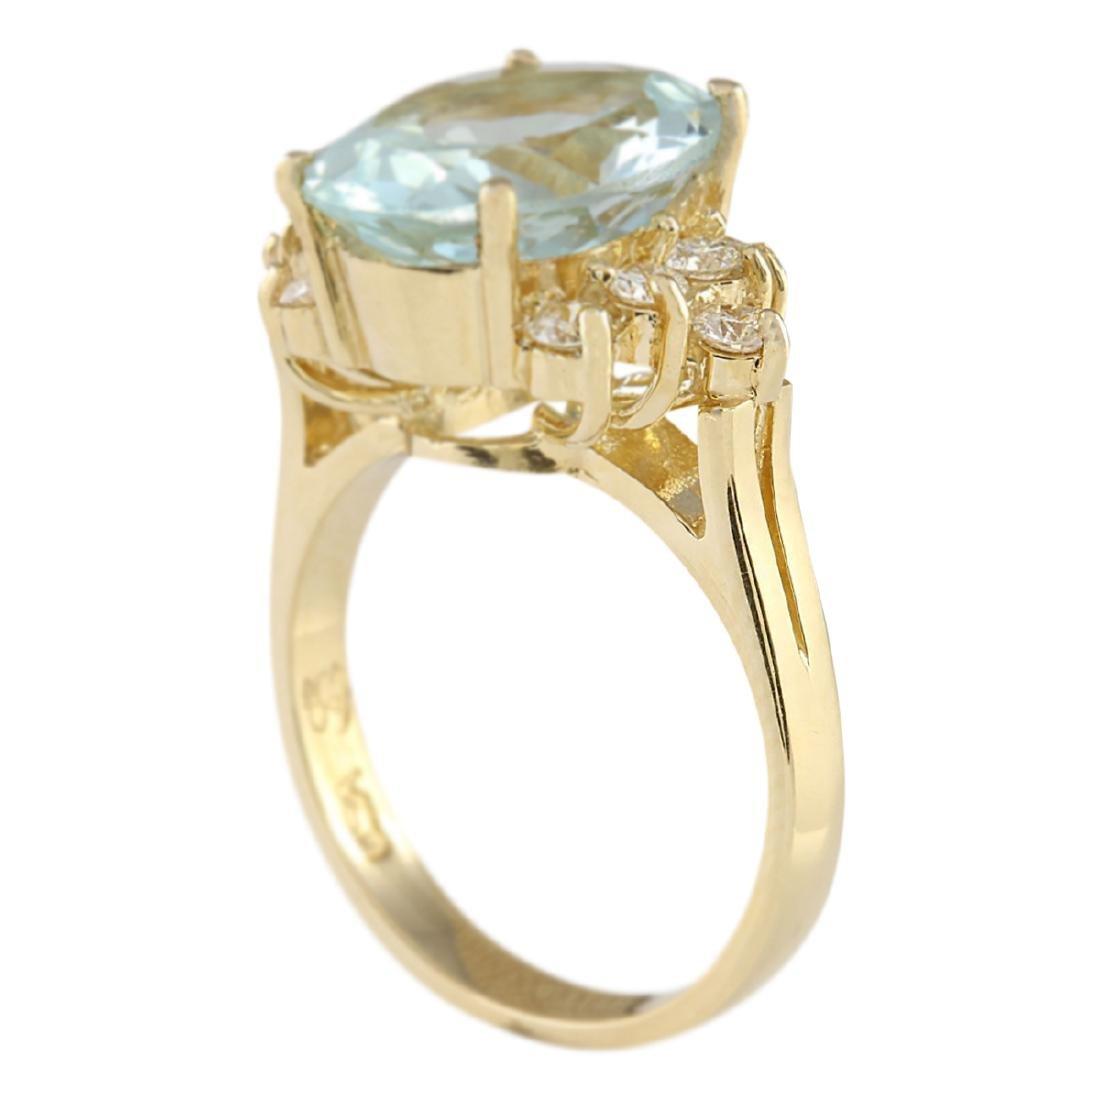 4.75 CTW Natural Aquamarine And Diamond Ring In 18K - 3